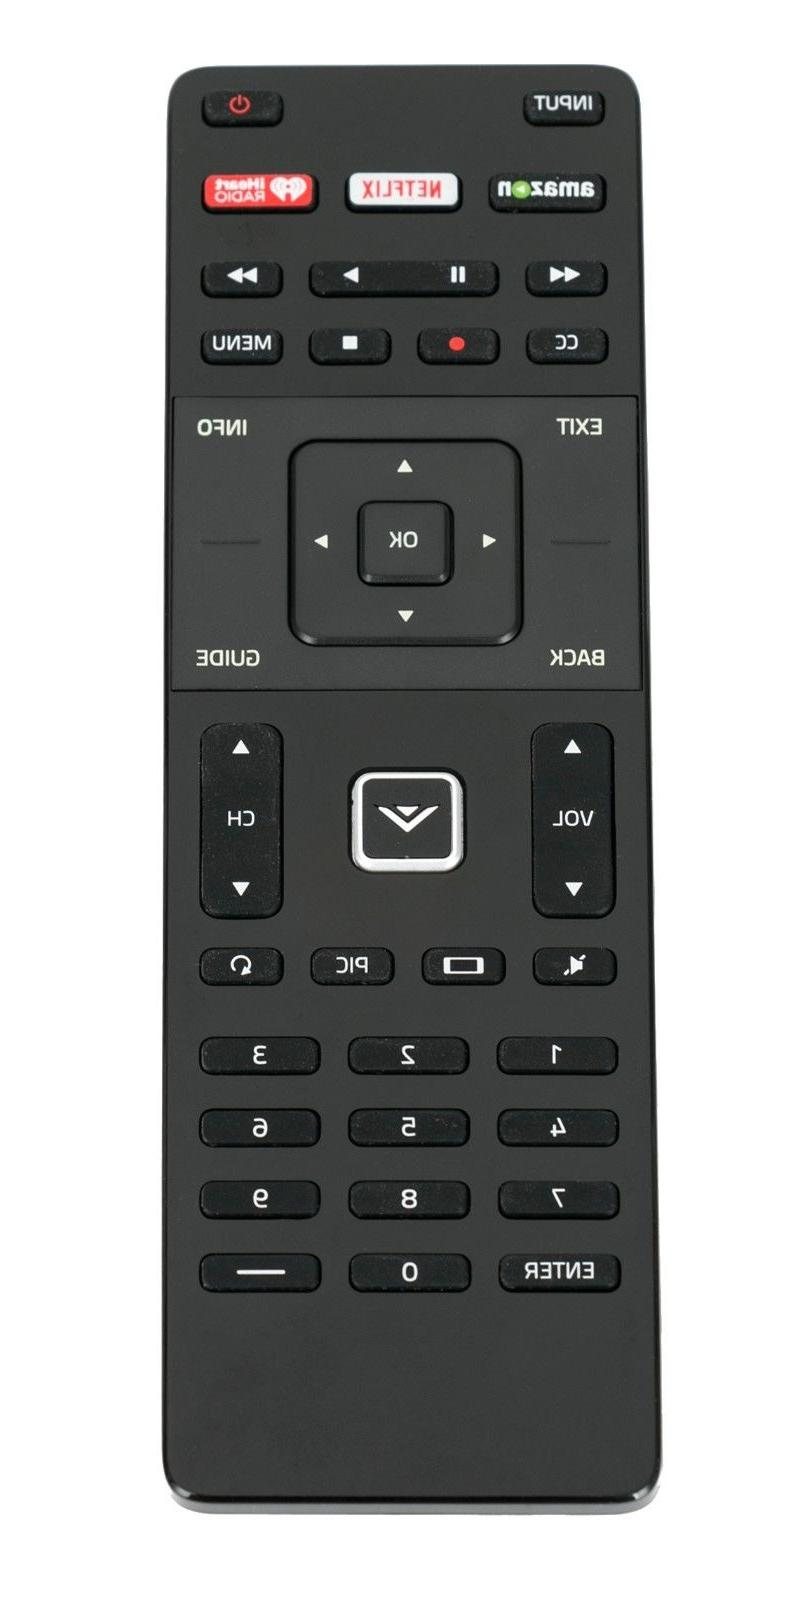 New Remote for Smart TV D55U-D1 E40-C2